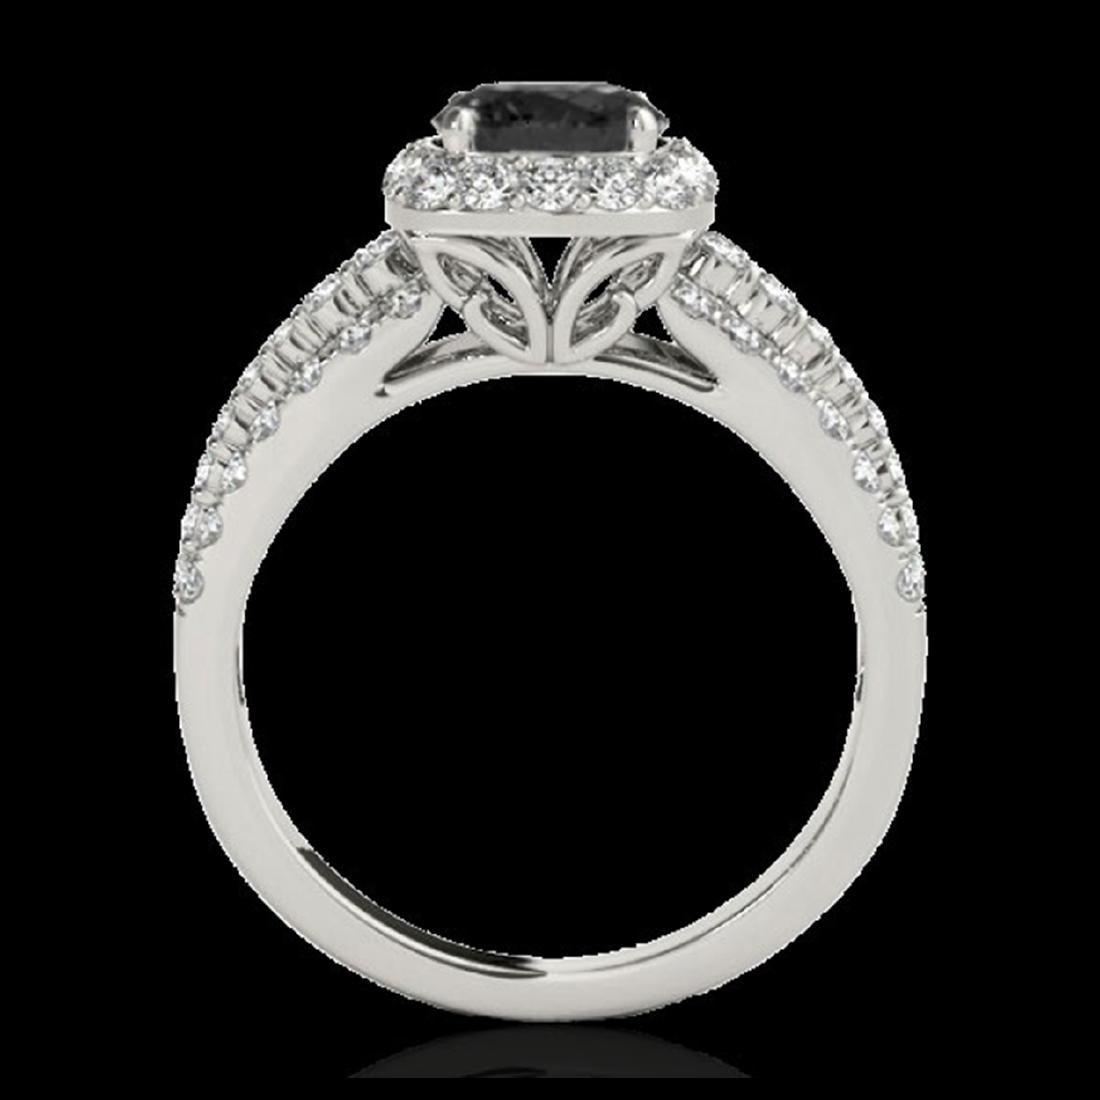 2.25 ctw VS Black Diamond Solitaire Halo Ring 10K White - 2